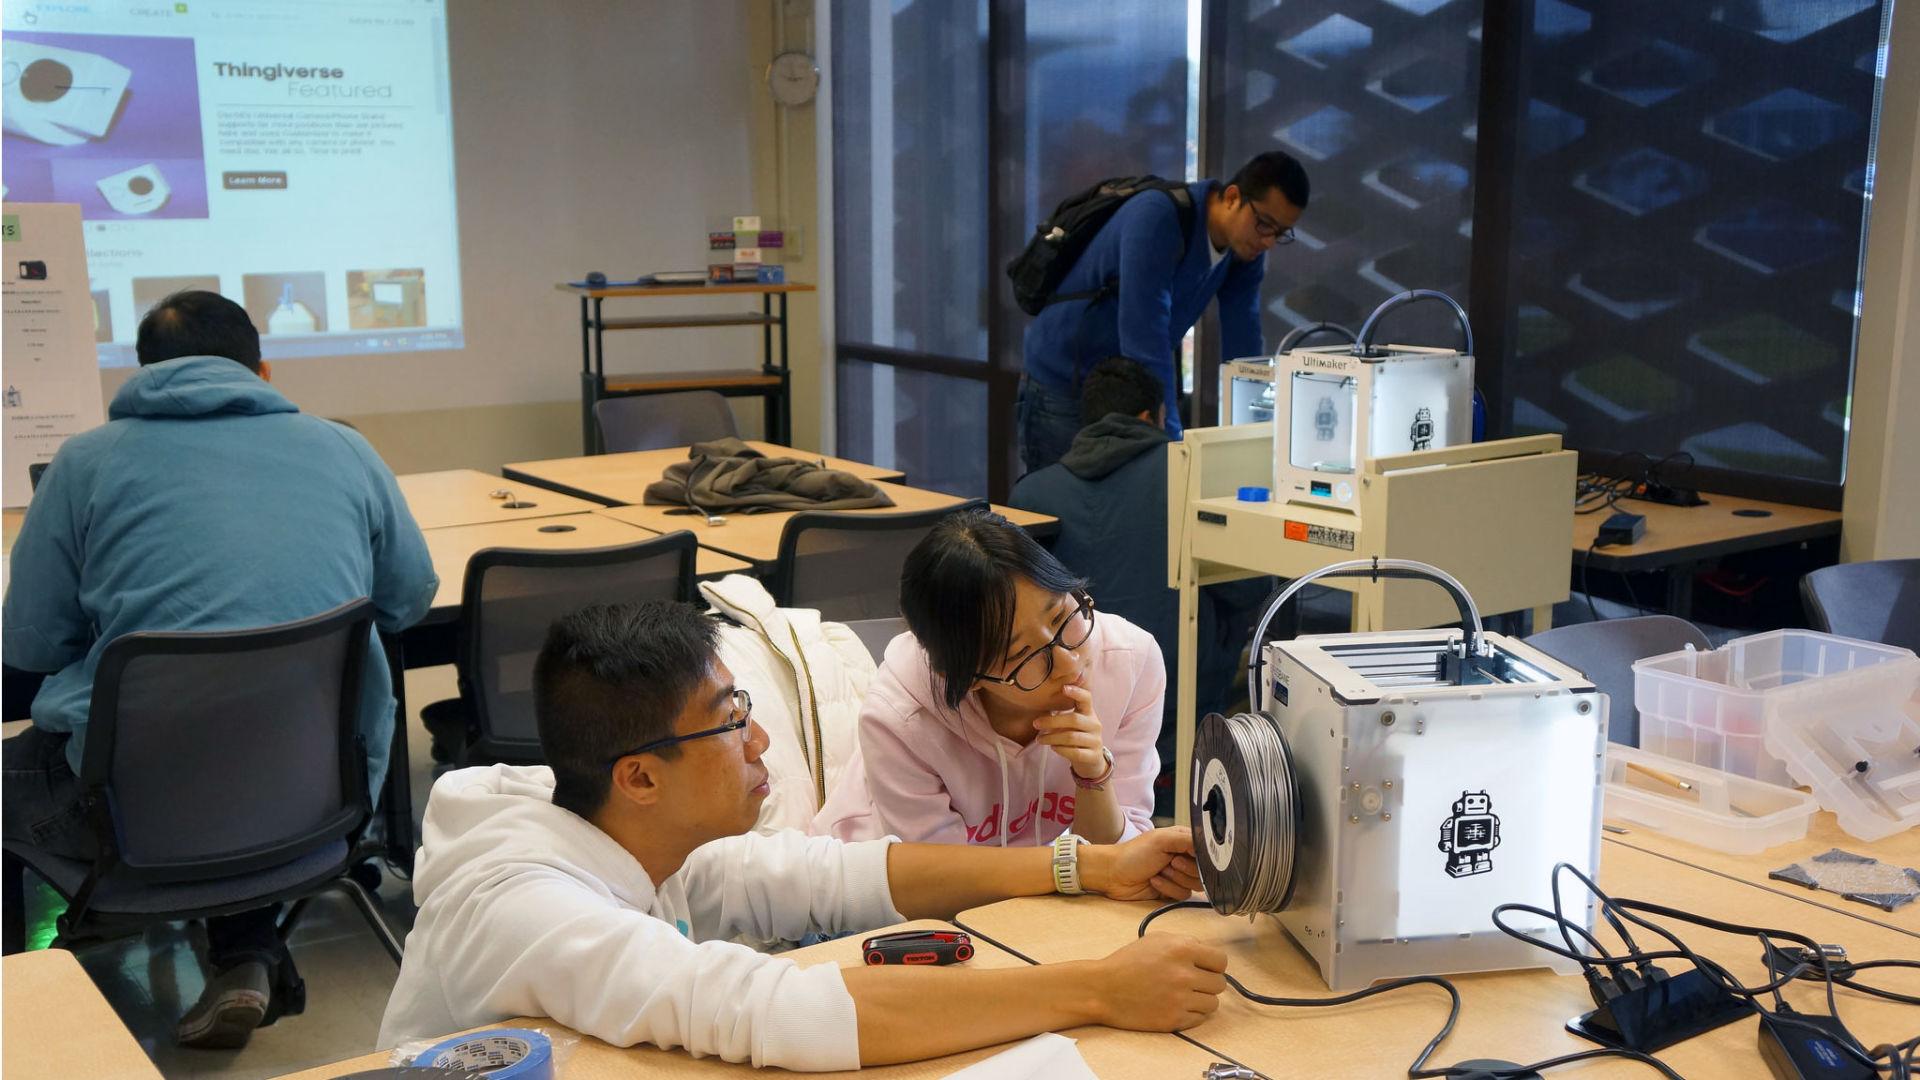 3D printing extravaganza